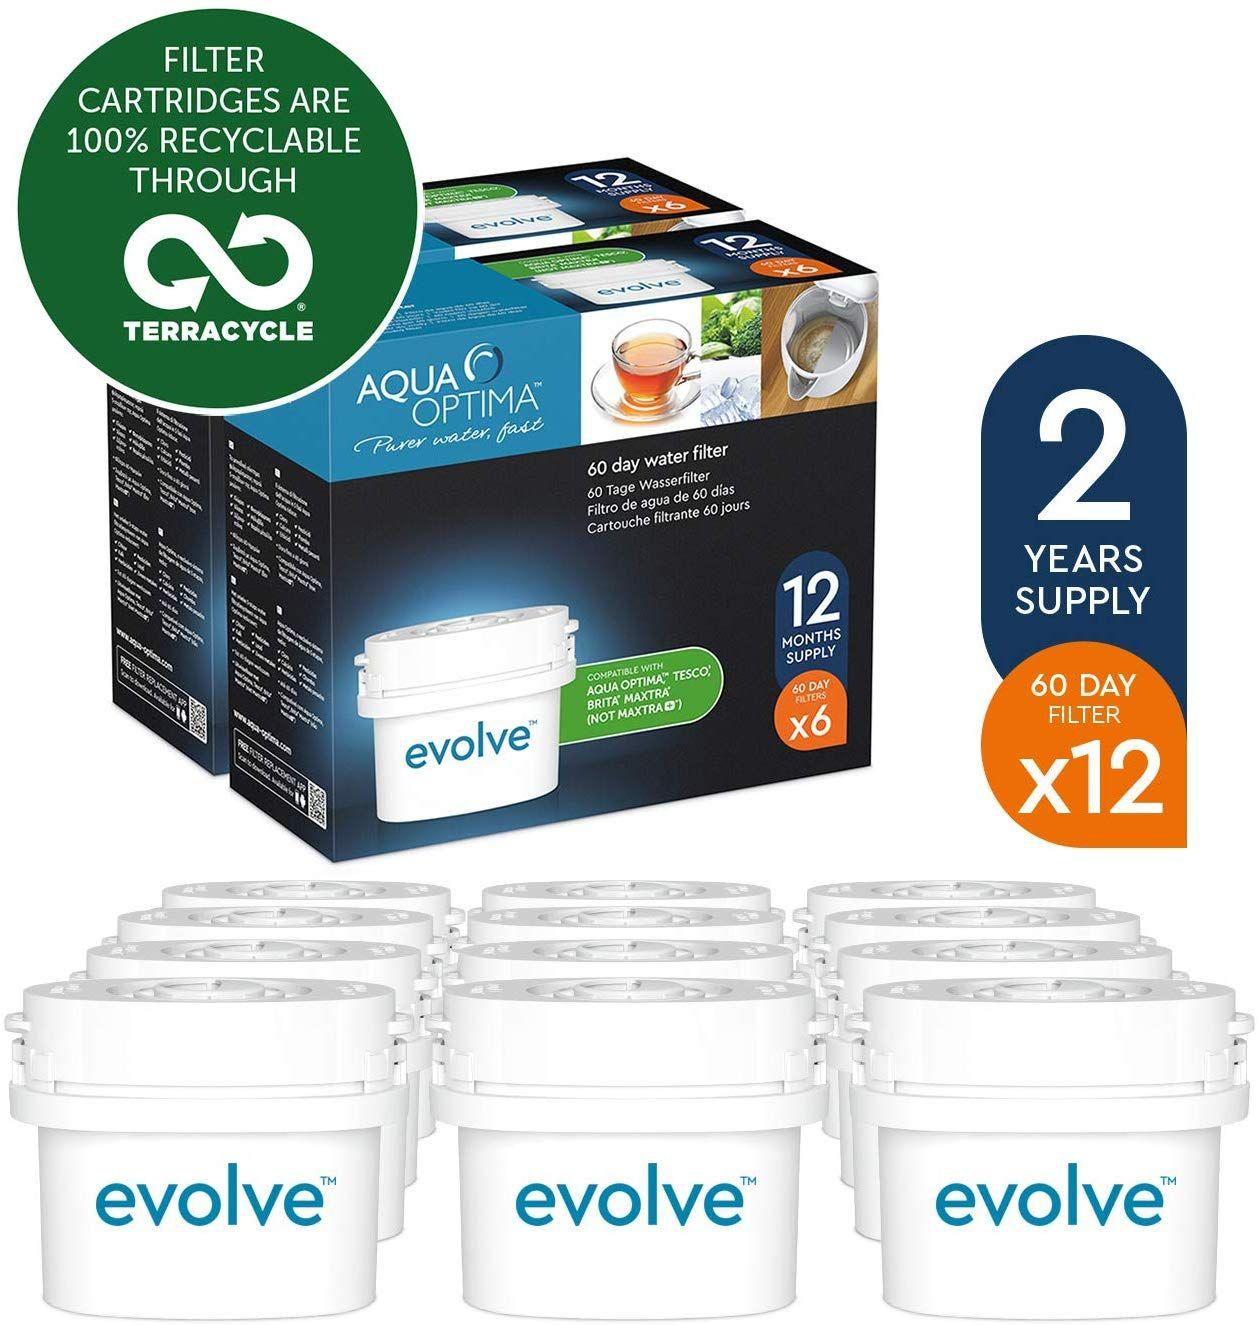 Aqua Optima Evolve 2 year pack, 12 x 60 day water filters - Fit BRITA Maxtra (not Maxtra+) - EVD912 - £21.81 @ Amazon